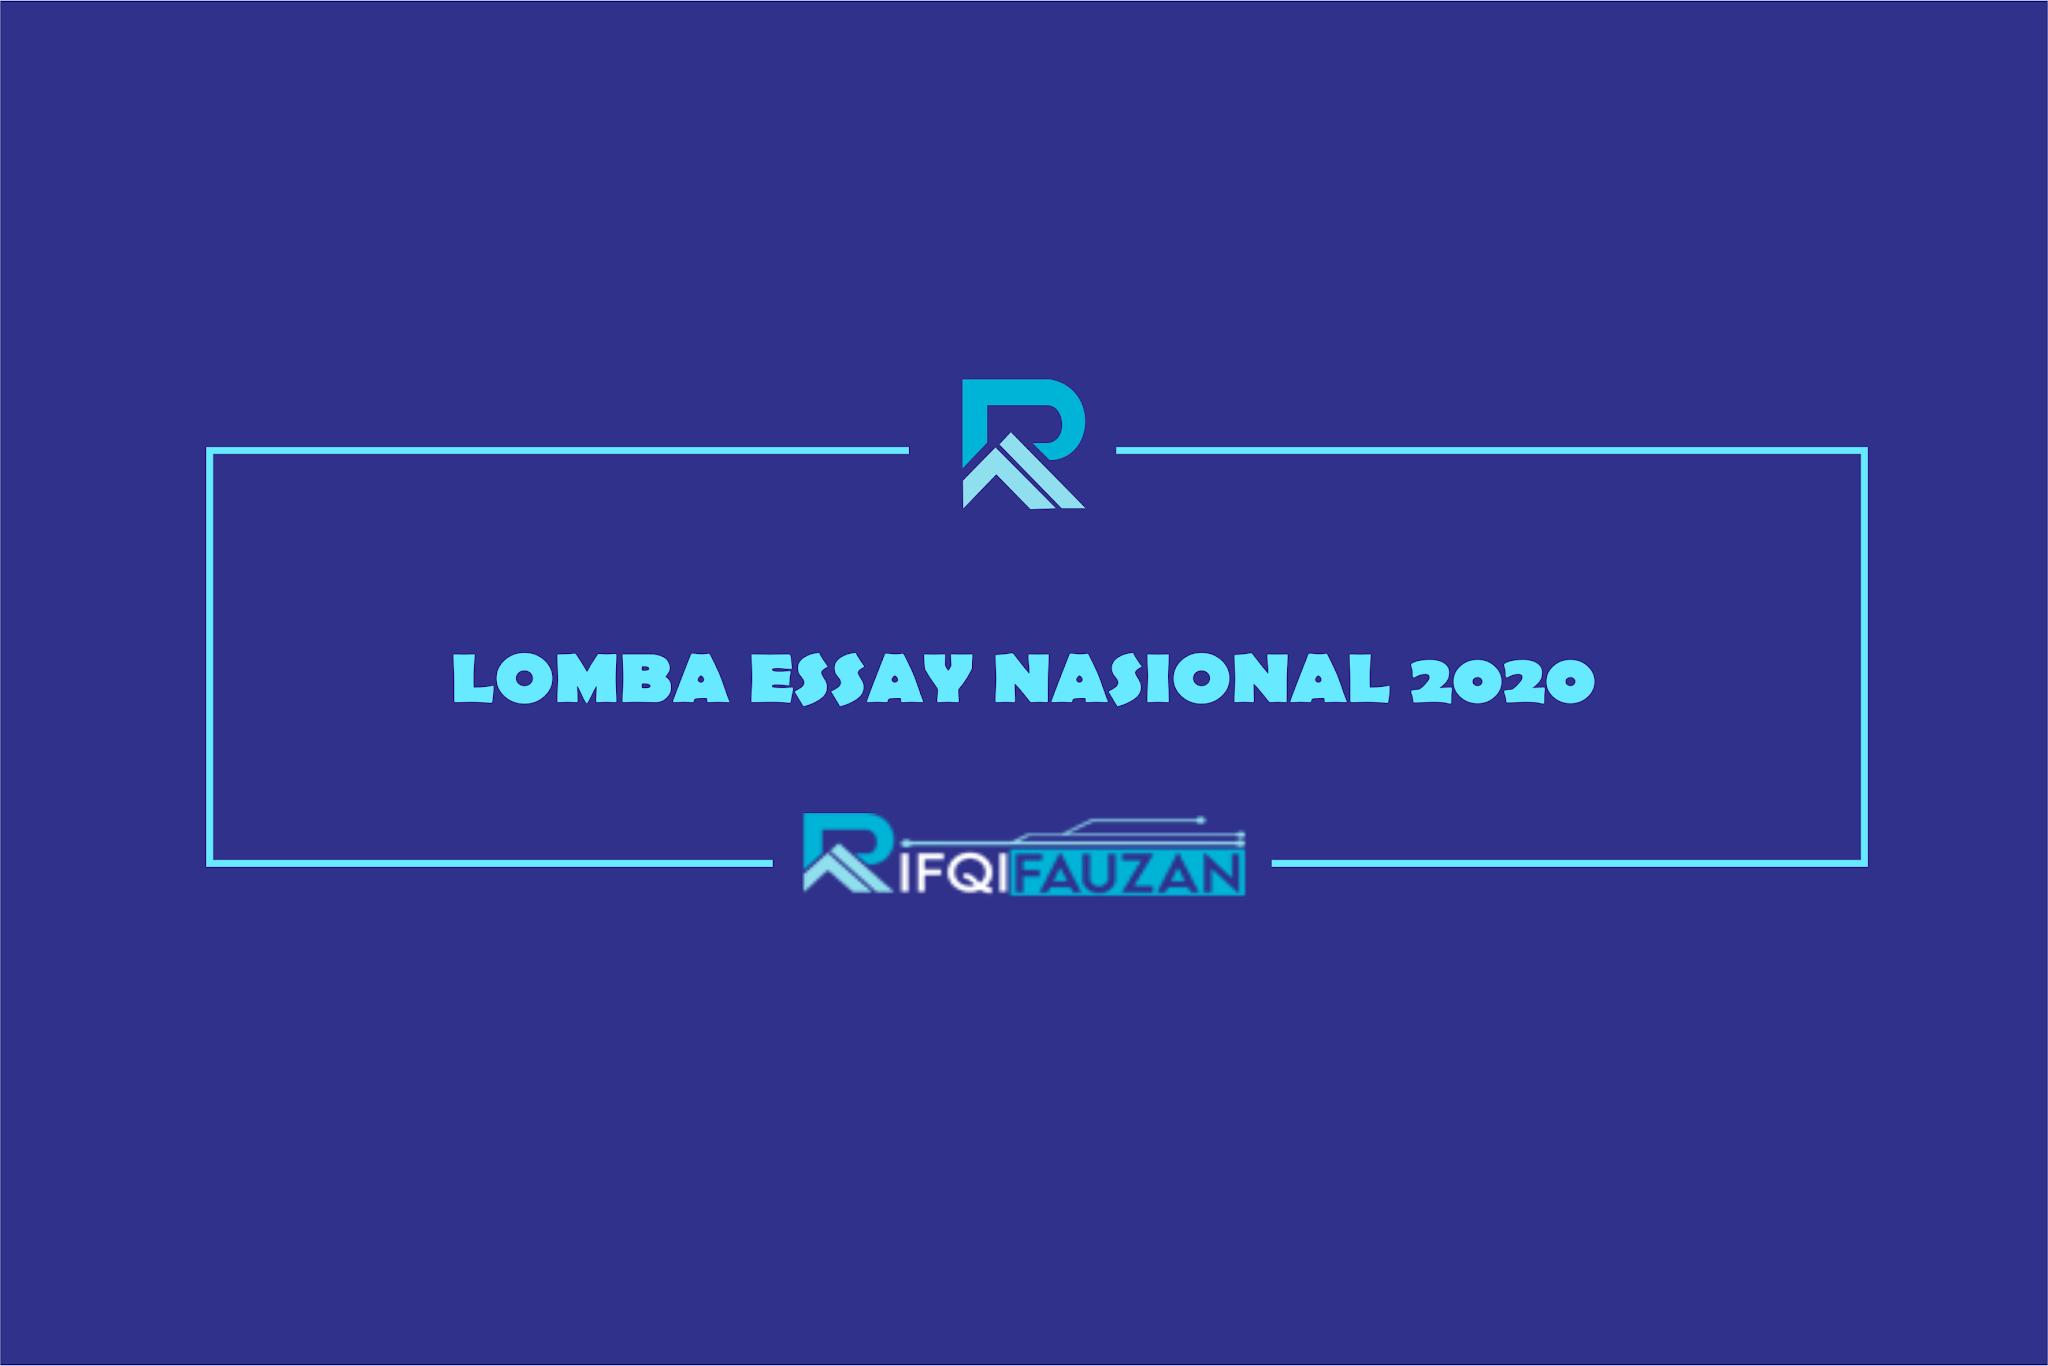 LOMBA ESSAY TINGKAT NASIONAL 2020